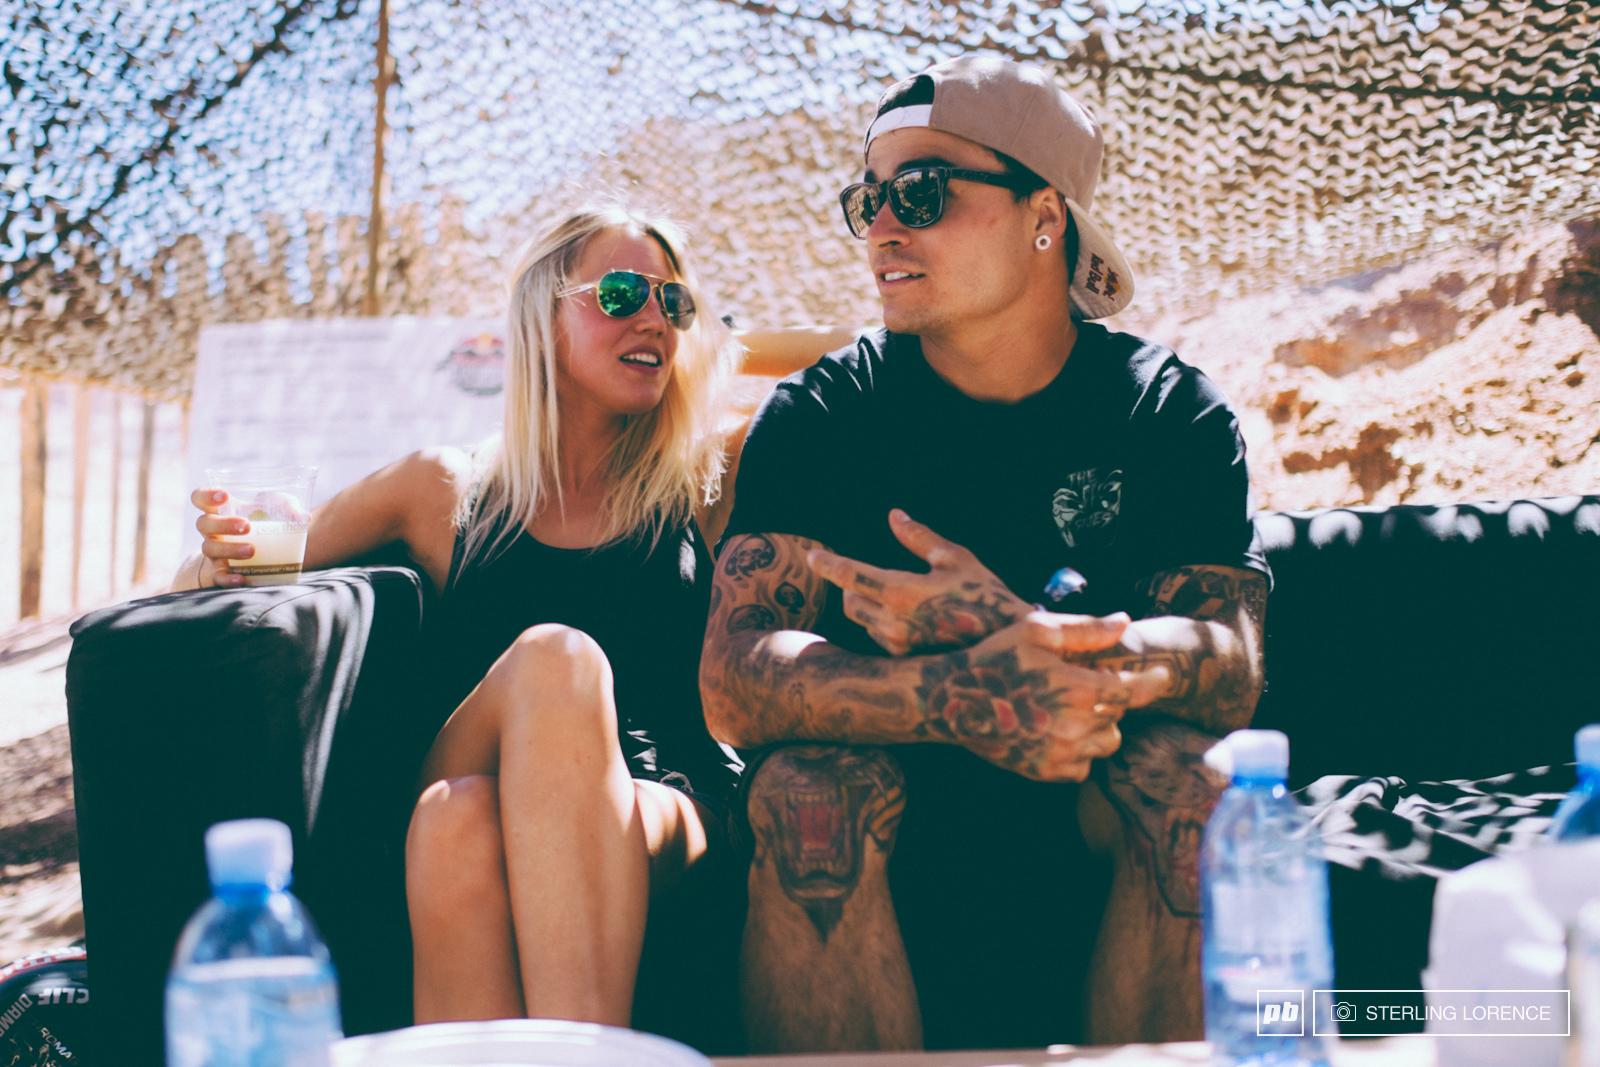 Andreu Lacondeguy and his girlfriend at RedBull Rampage 2014